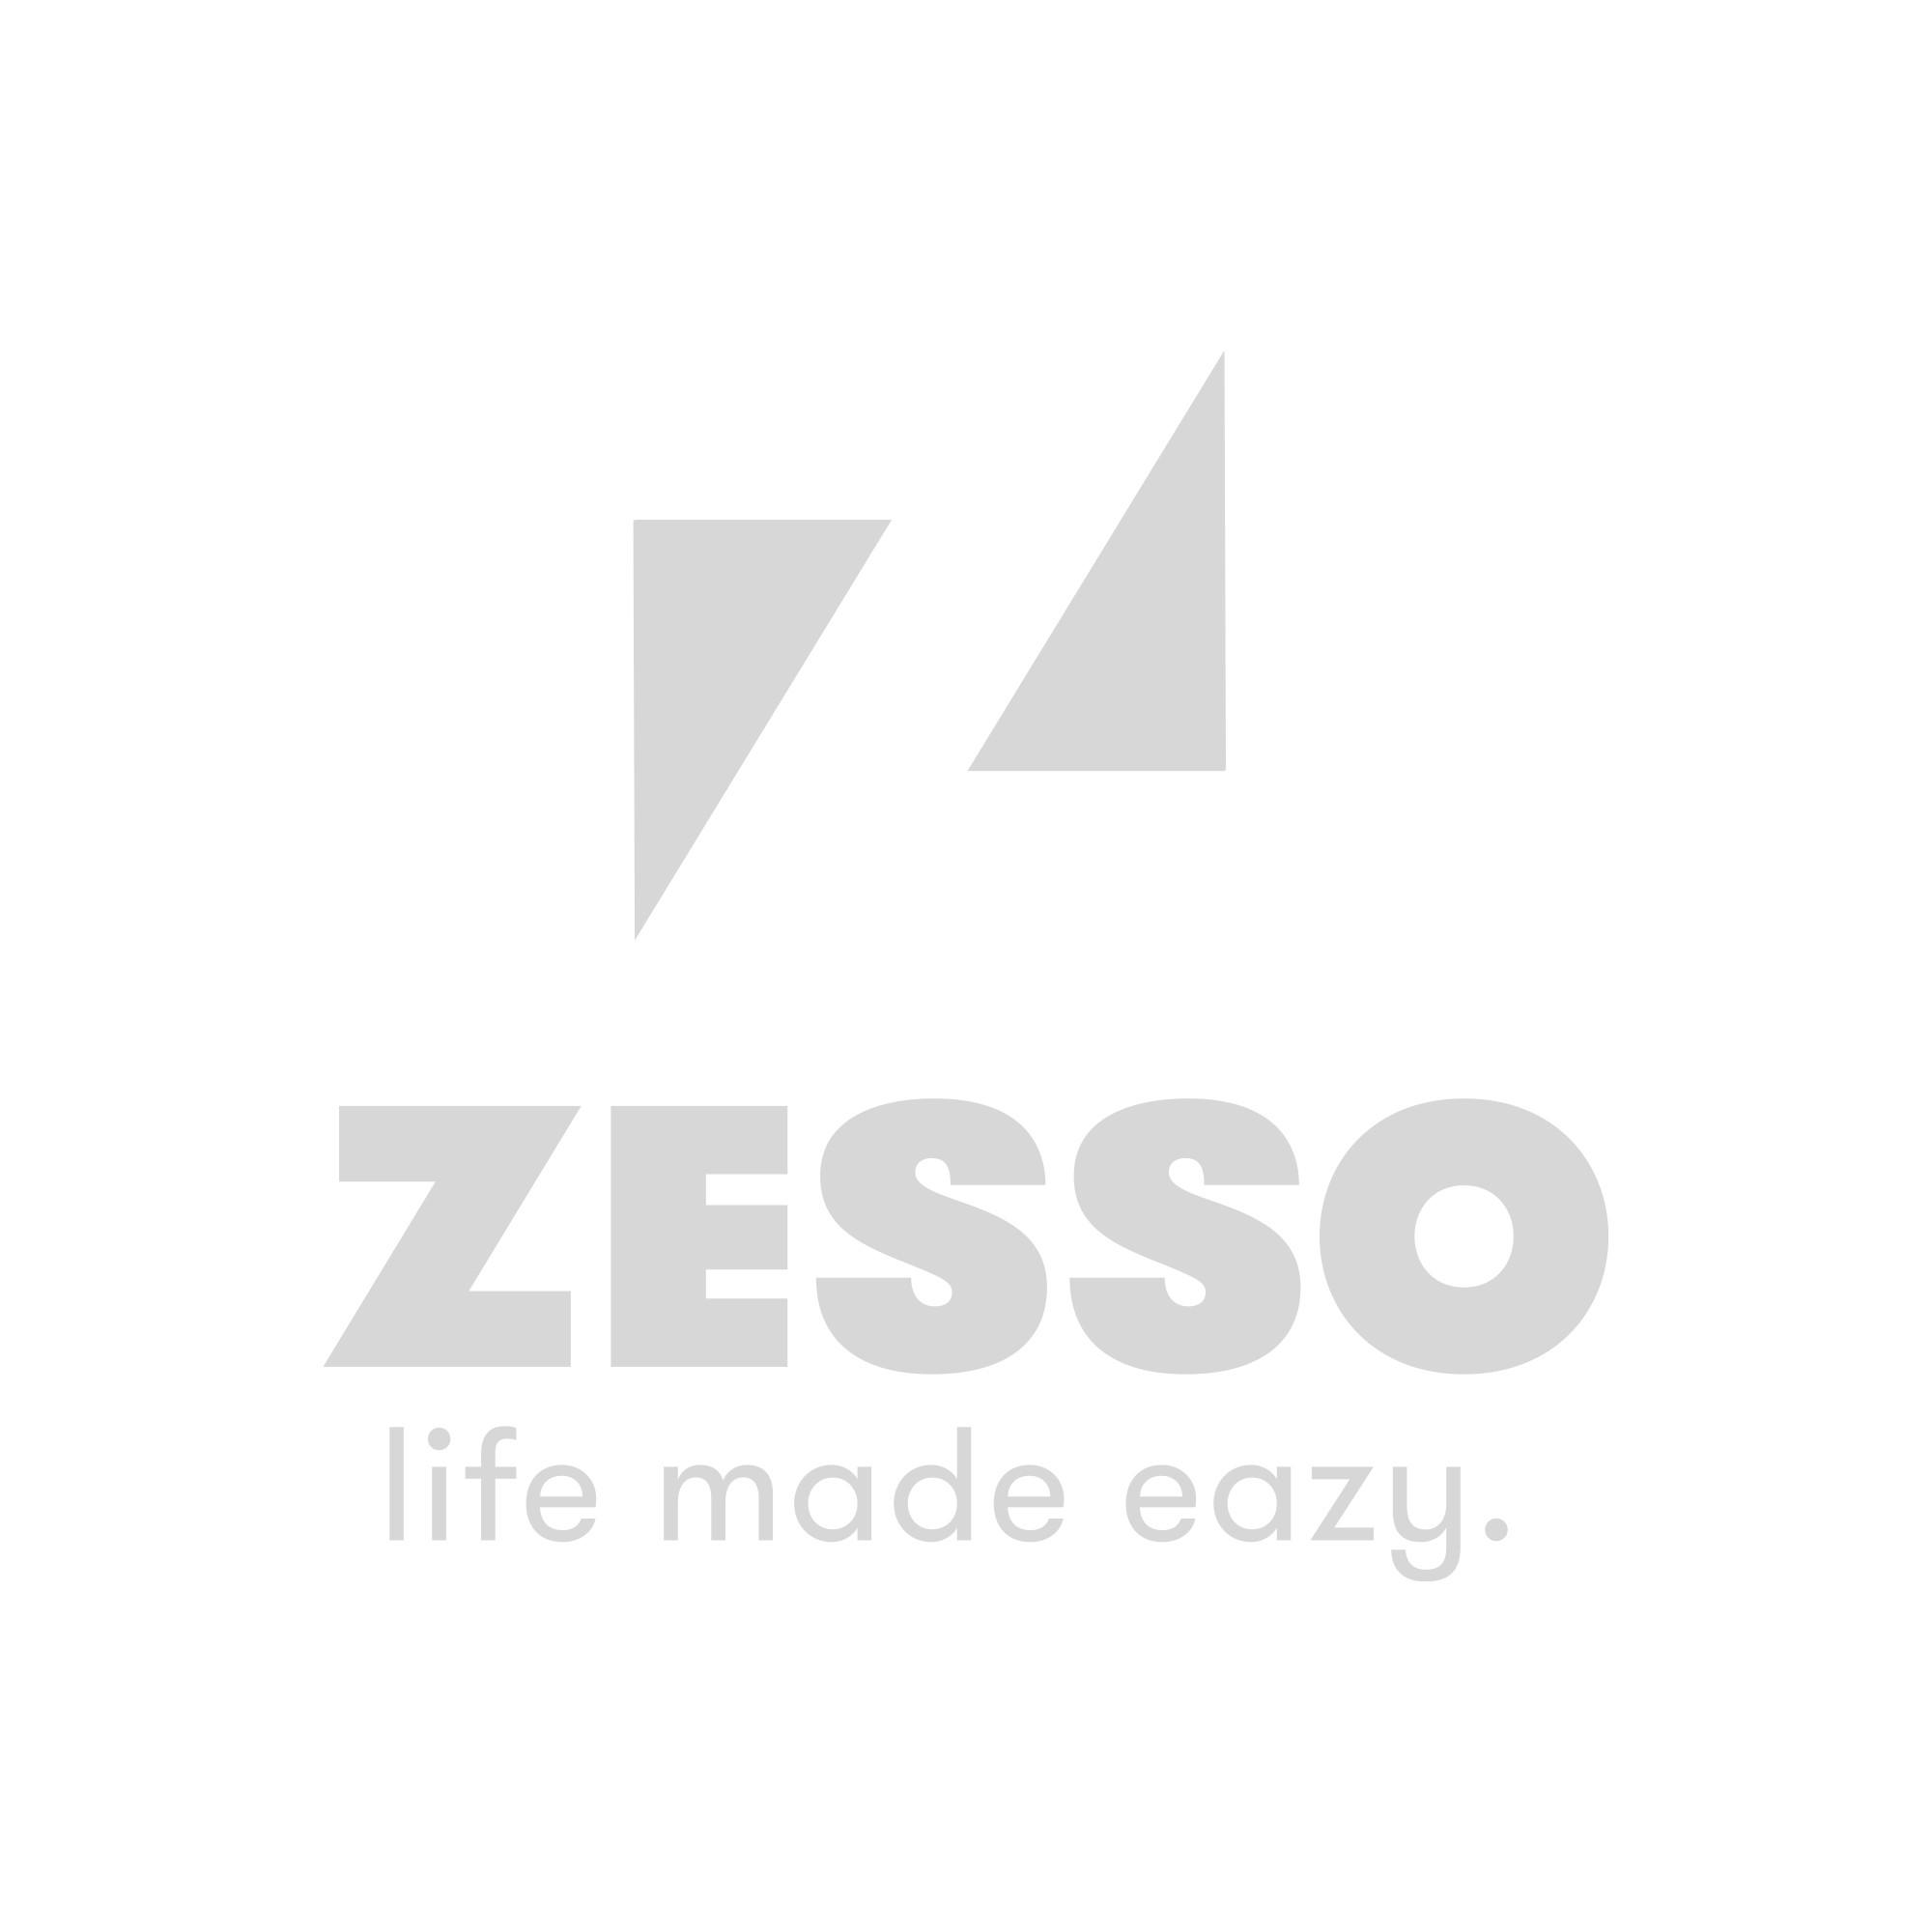 KidsDepot Vloerkleed Bear Grijs 150 cm x 110 cm